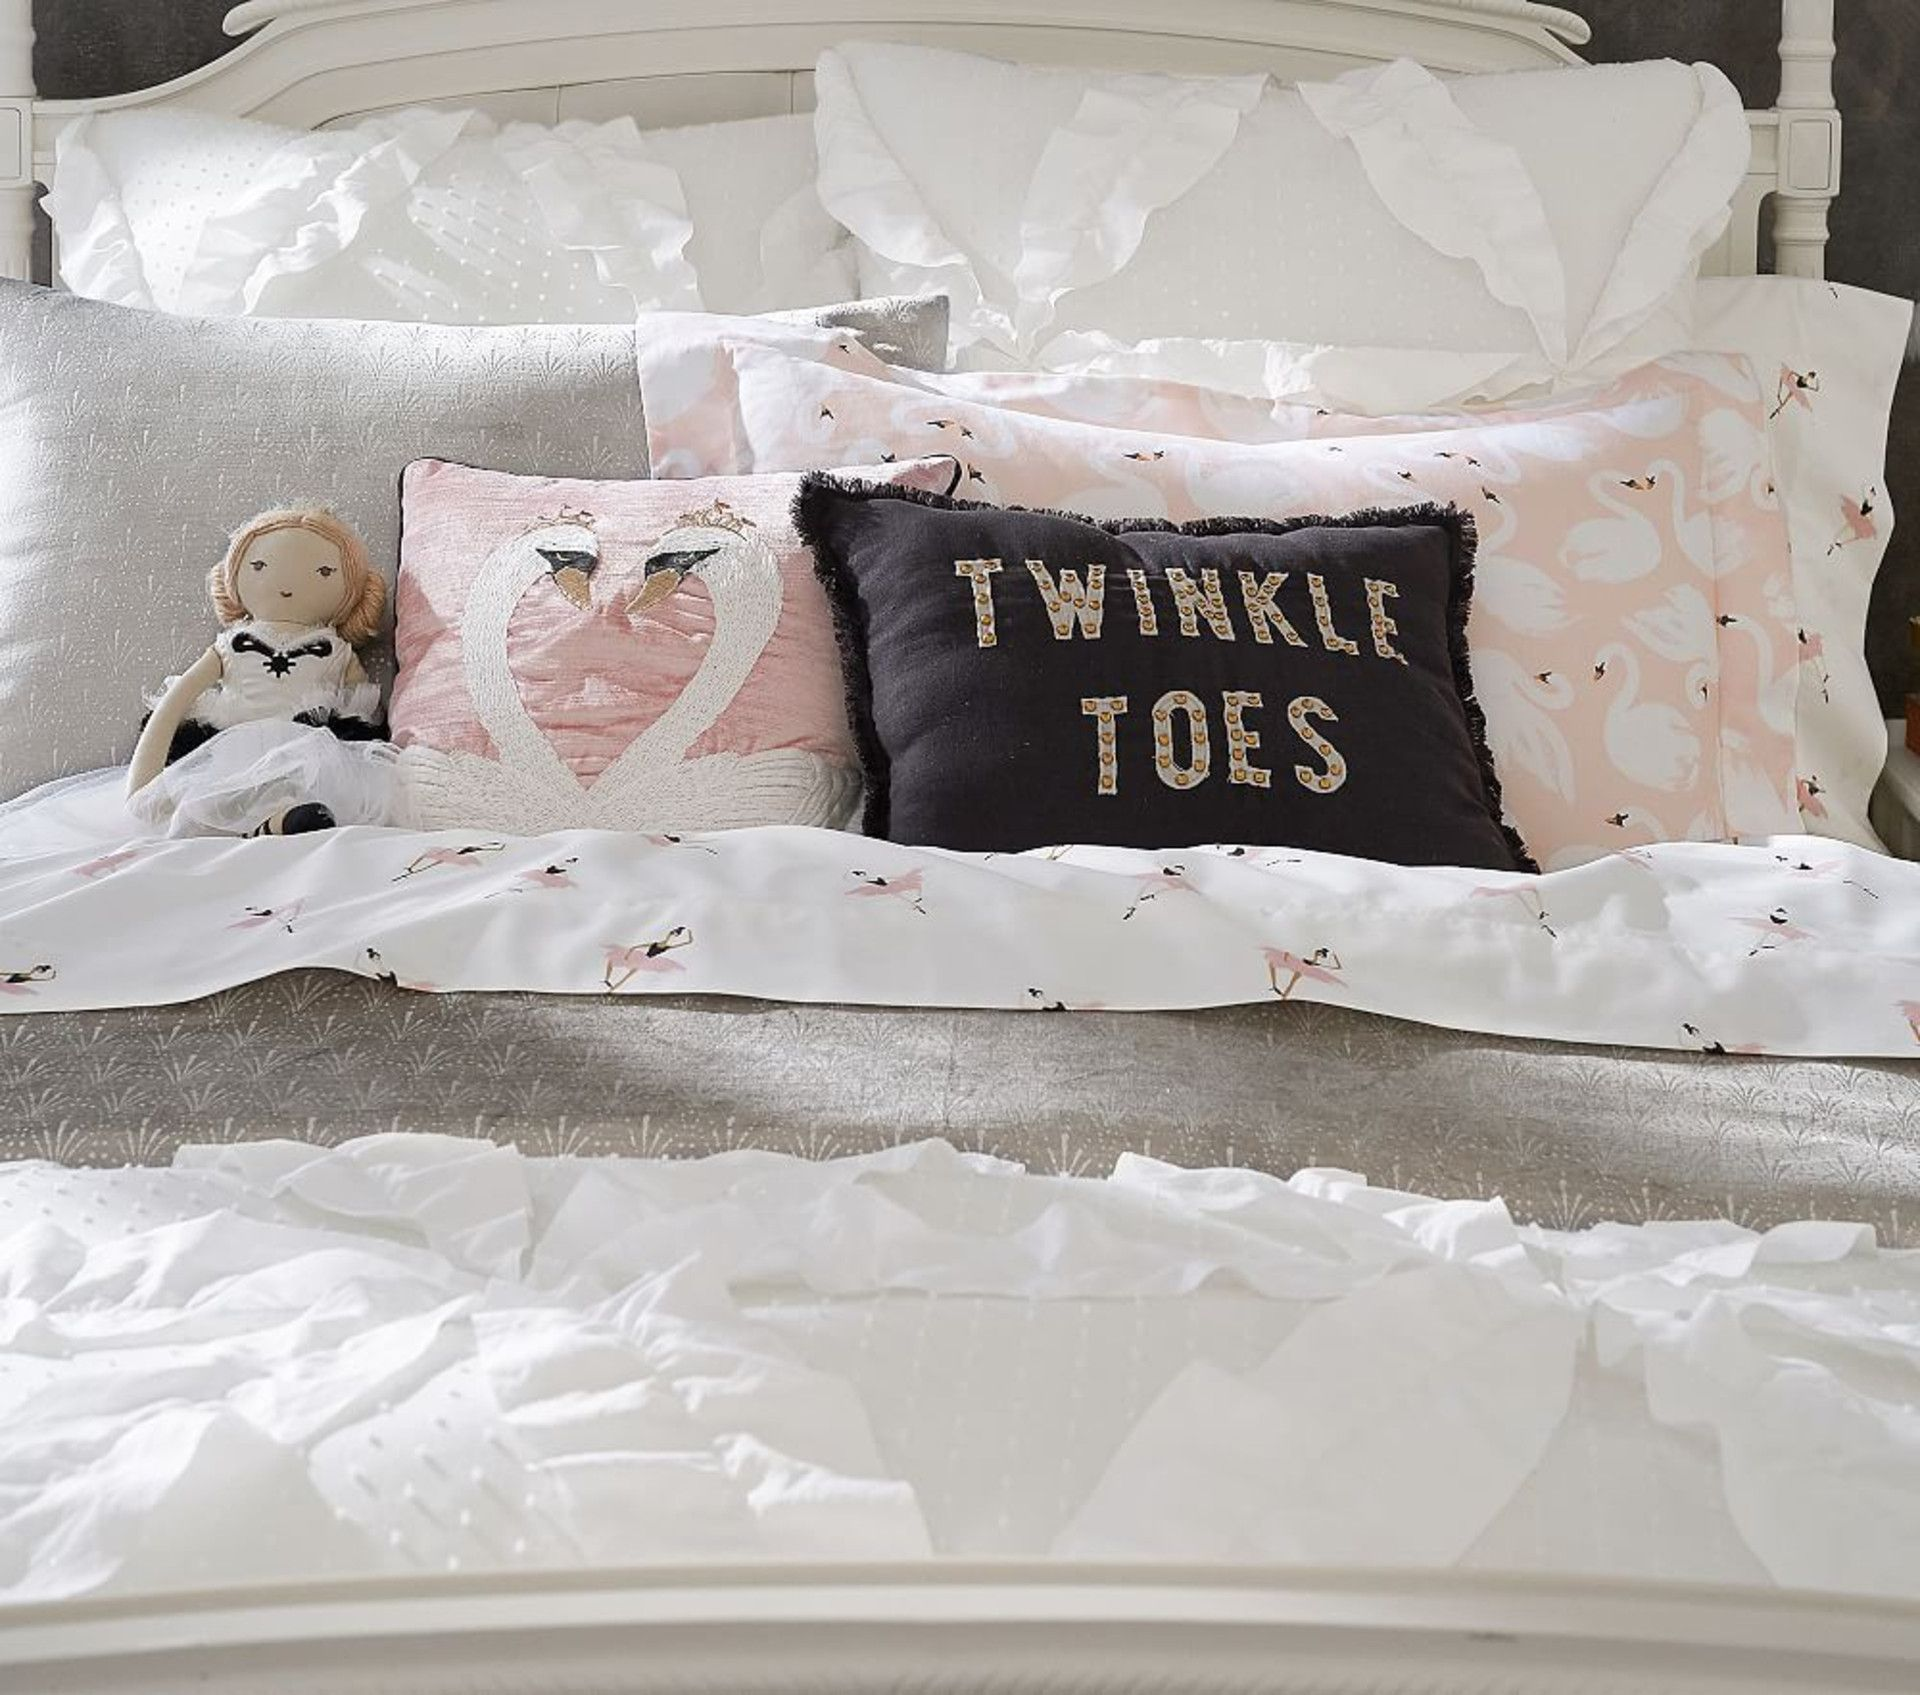 The Emily & Meritt Twinkle Toes Cushion Pottery Barn